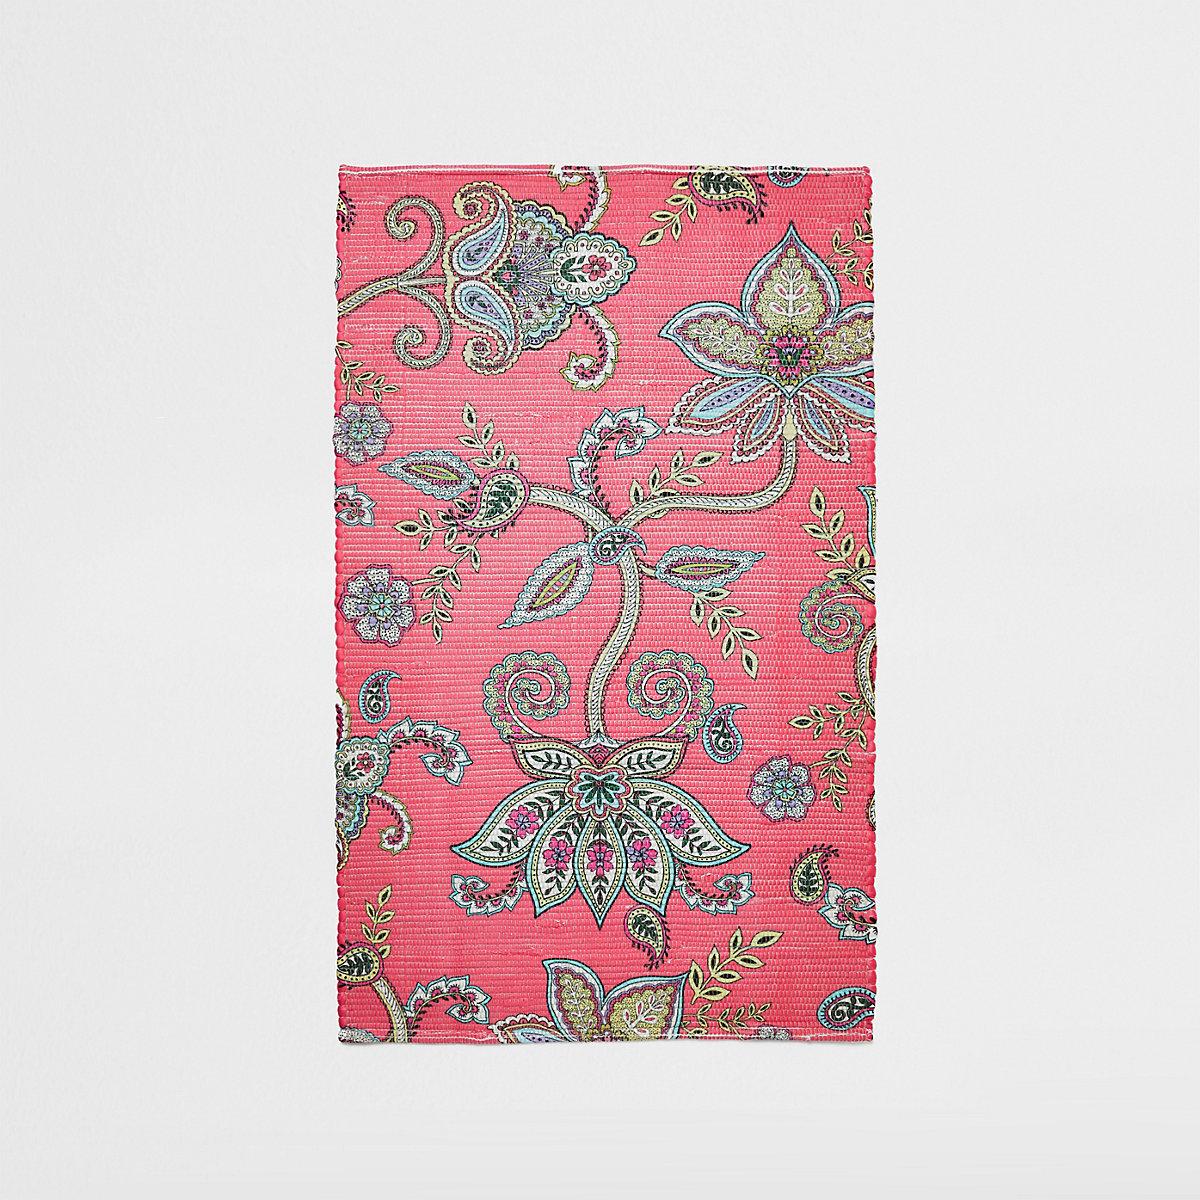 Small pink floral printed rug